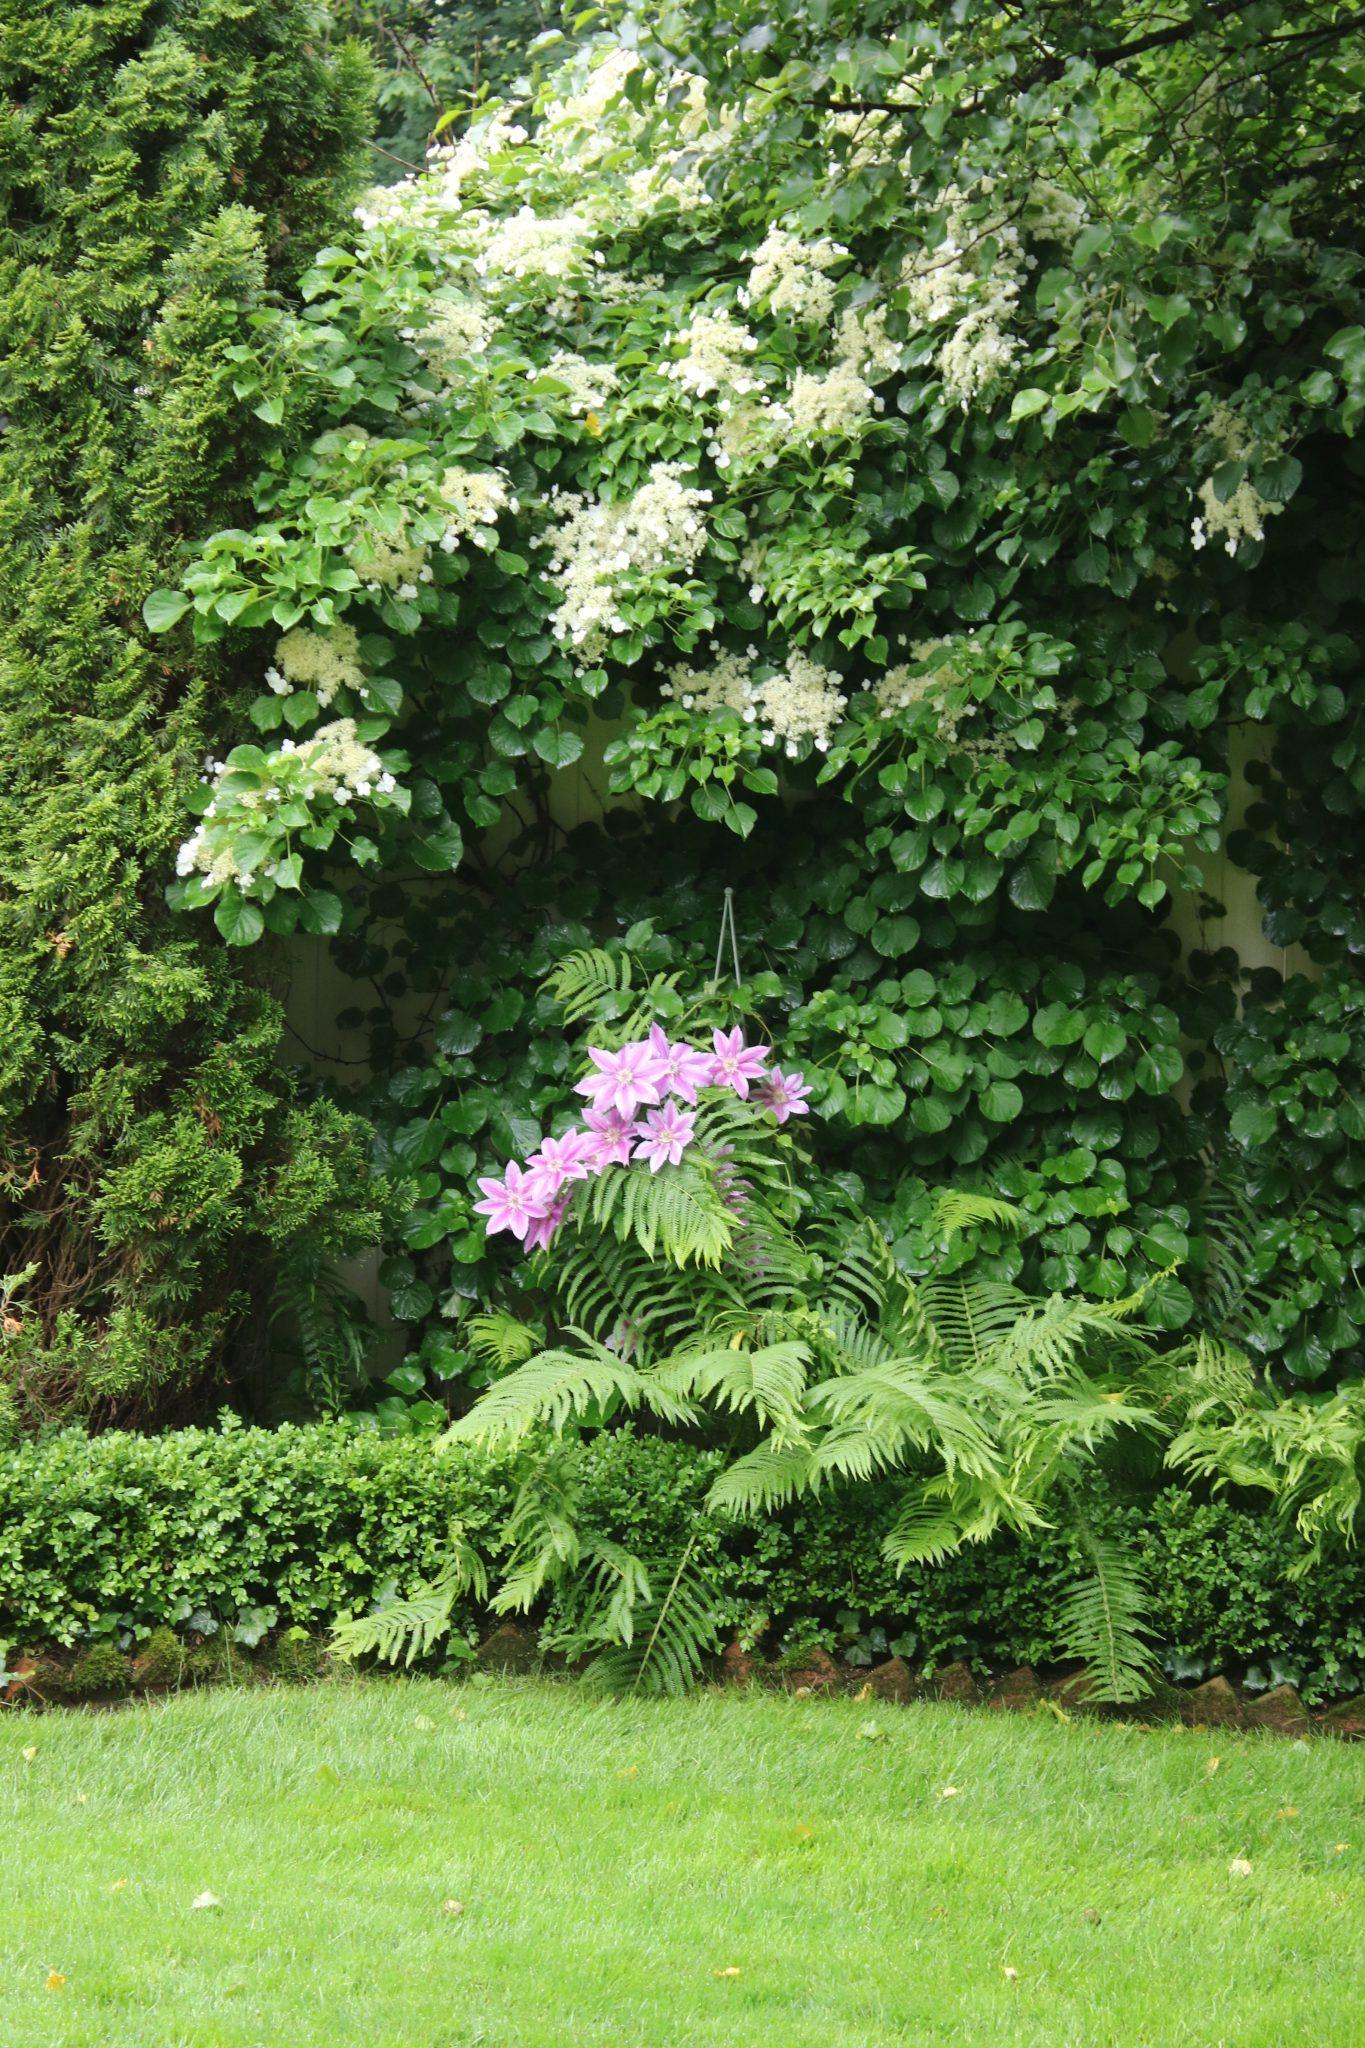 Pin by Katrina Spears on Zone 5 Gardening   Gardening tips ...